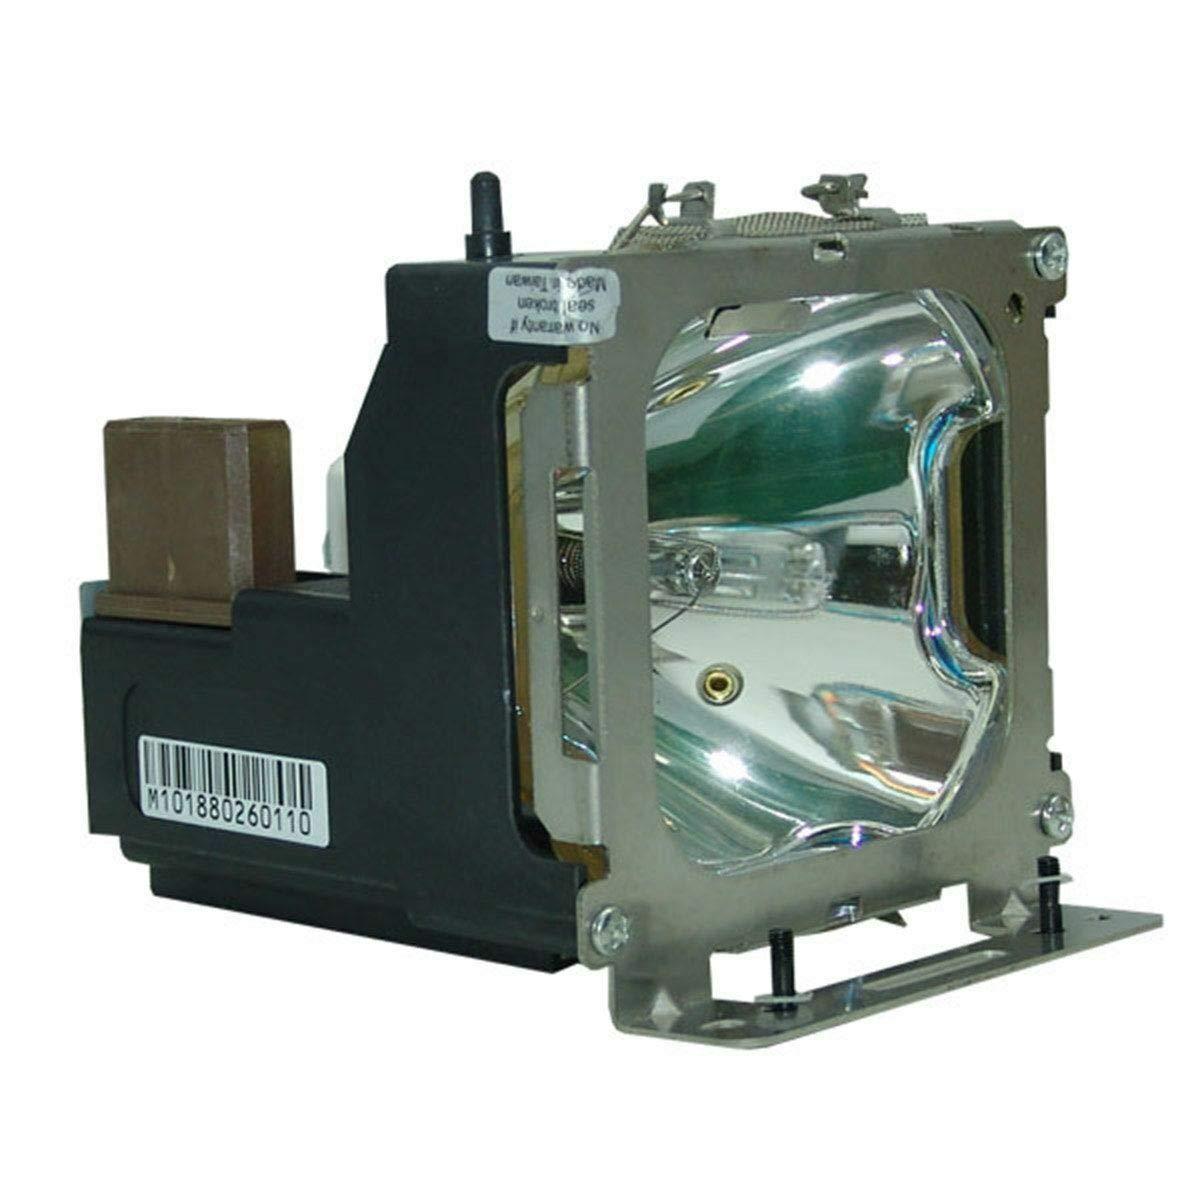 CTLAMP RLC-043 交換用ランプ電球 ハウジング付き VIEWSONIC PJL9520に対応   B07P9YKQKS